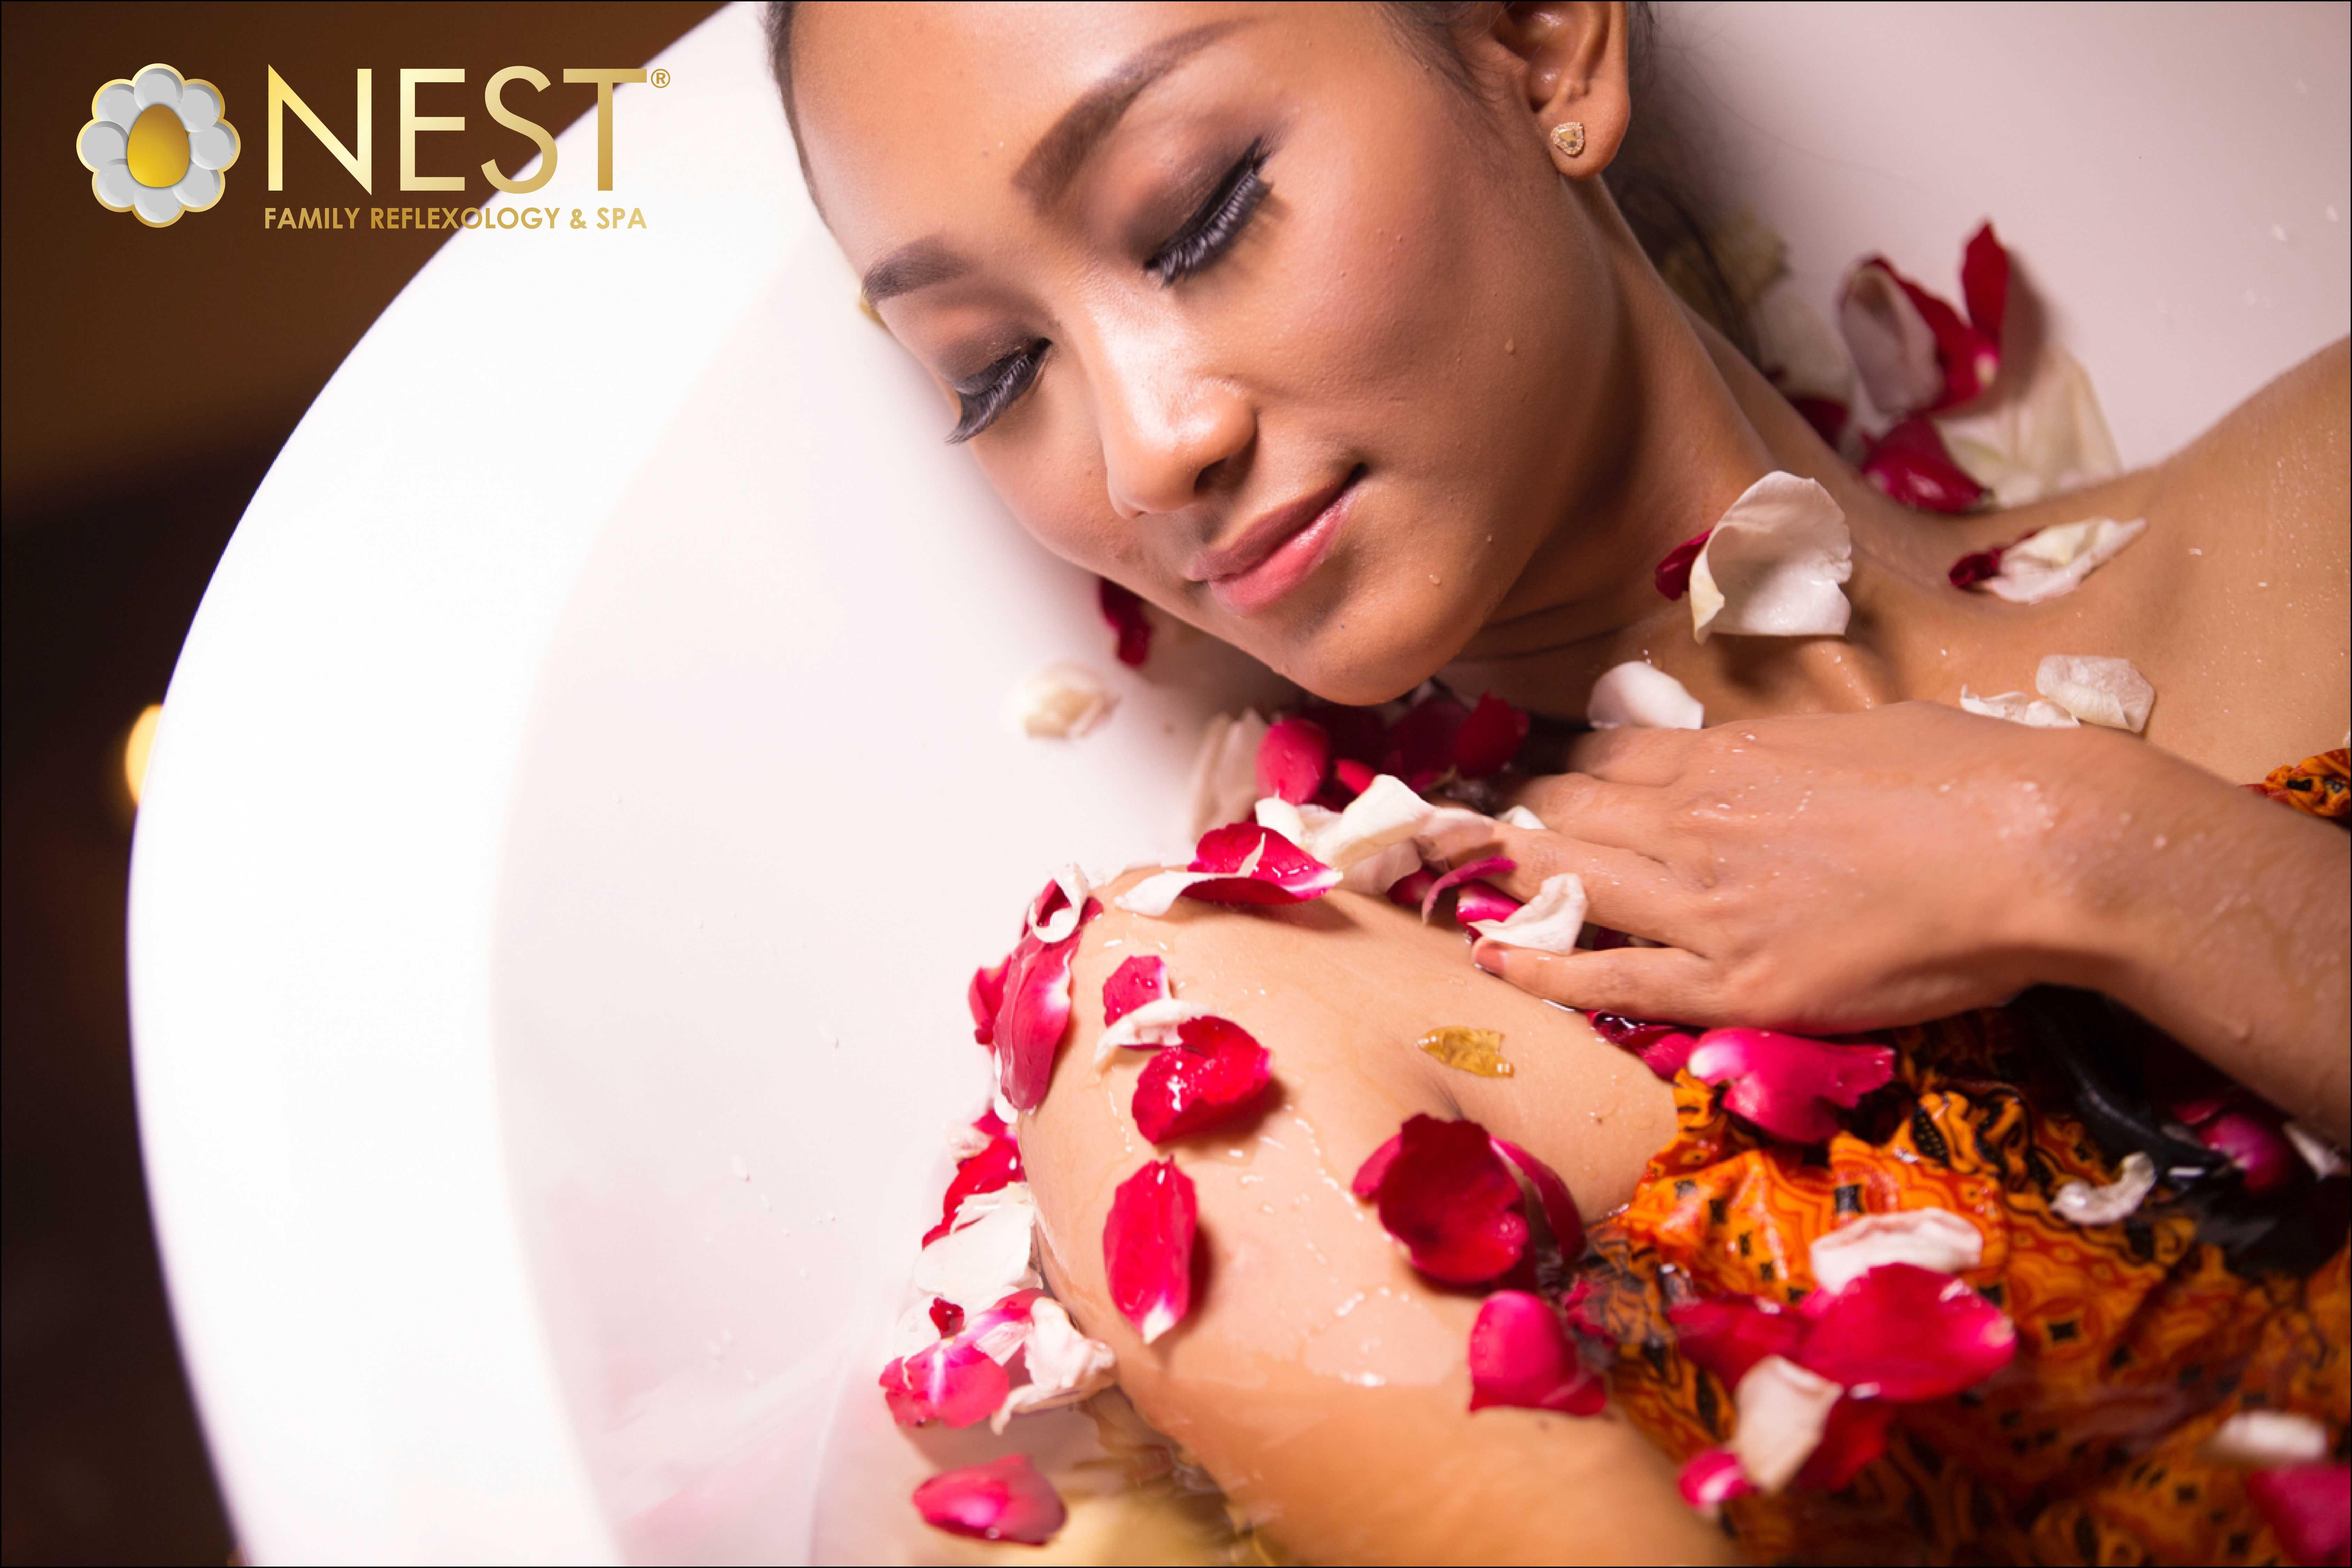 Nest Spa - Best spa in batam